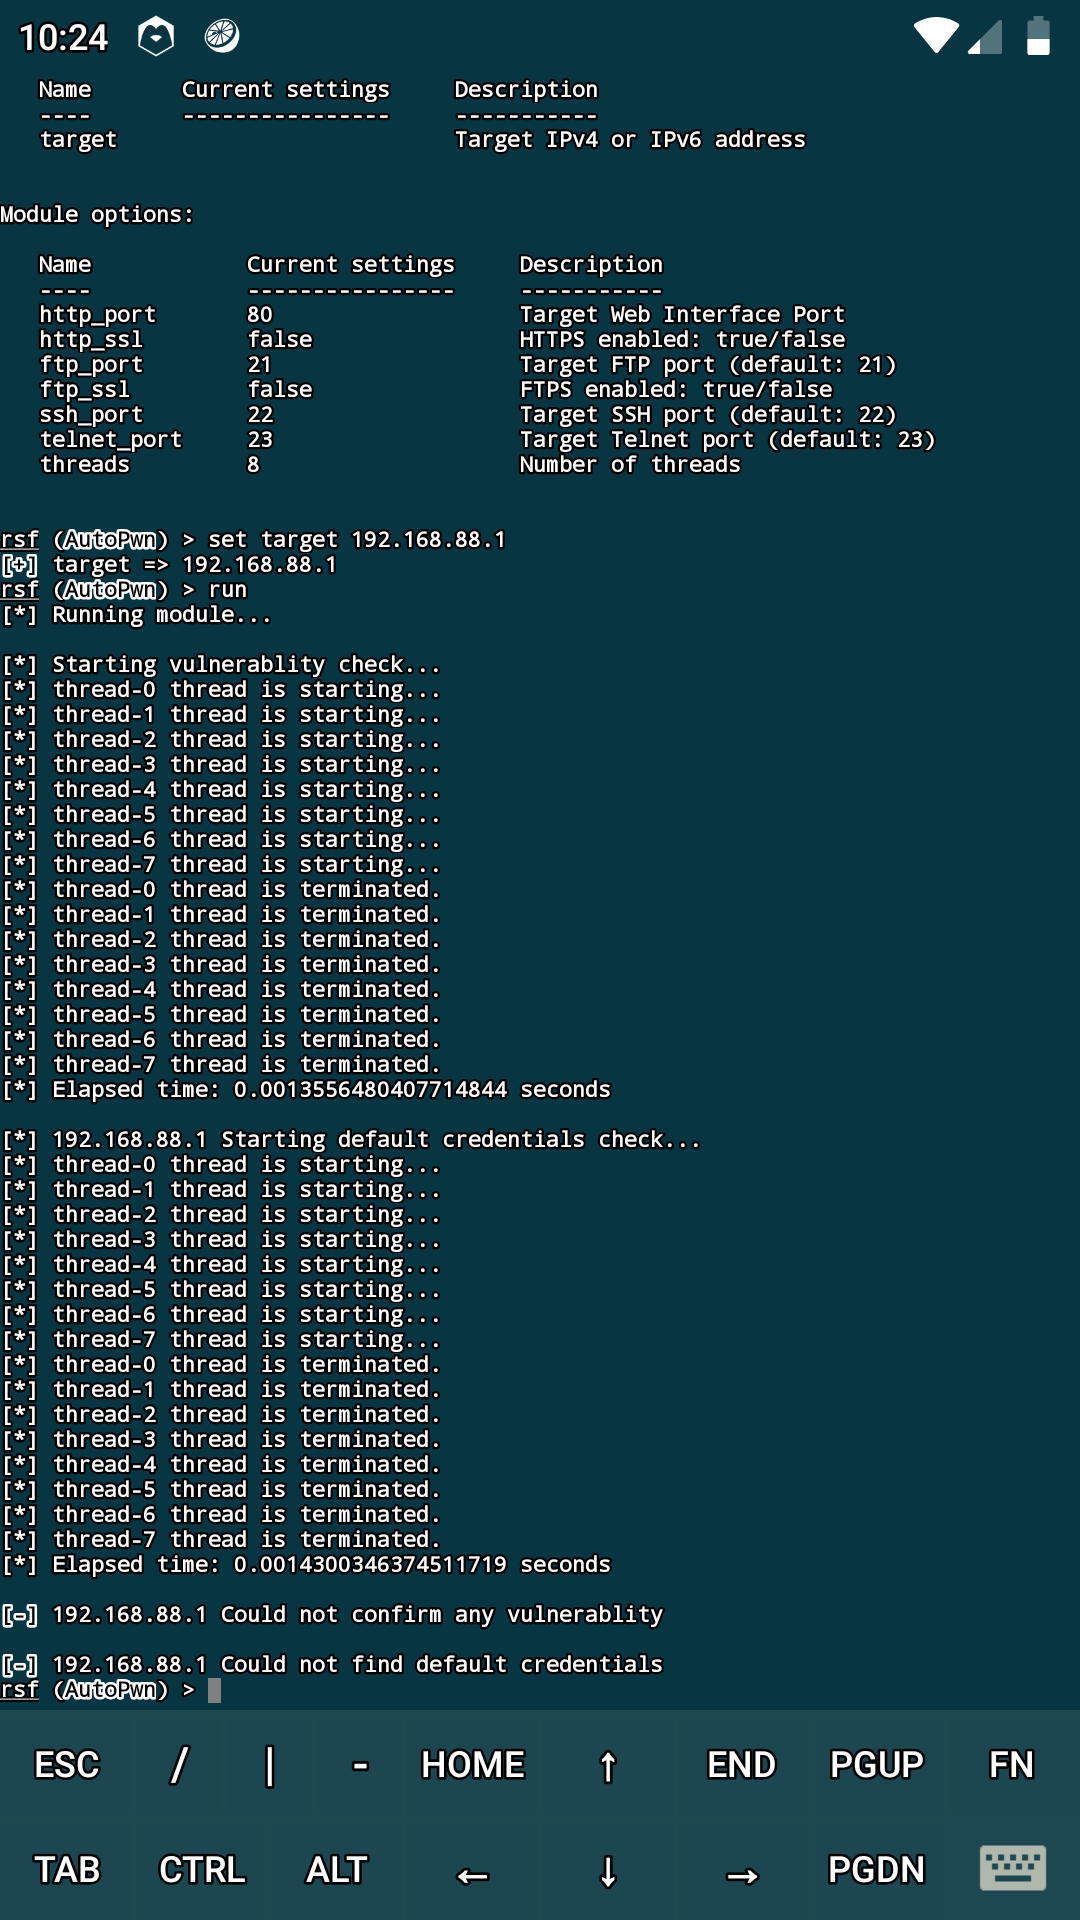 Help - when i run routersploit on Kali  it stop working on